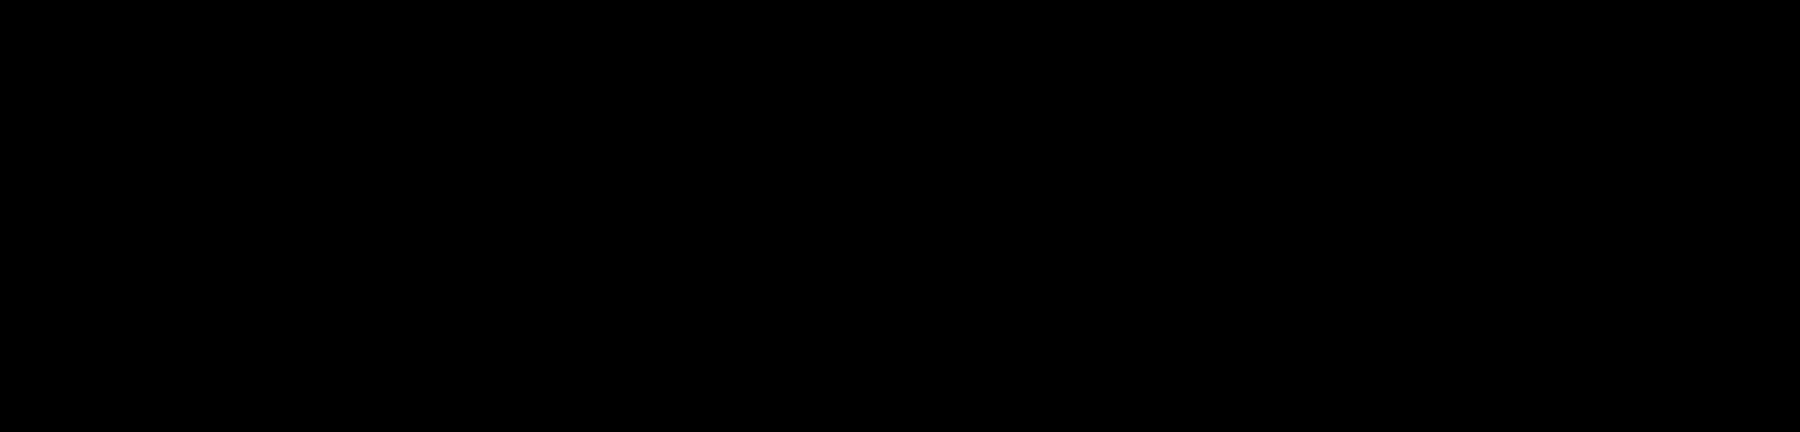 (S)-Pramipexole dihydrochloride